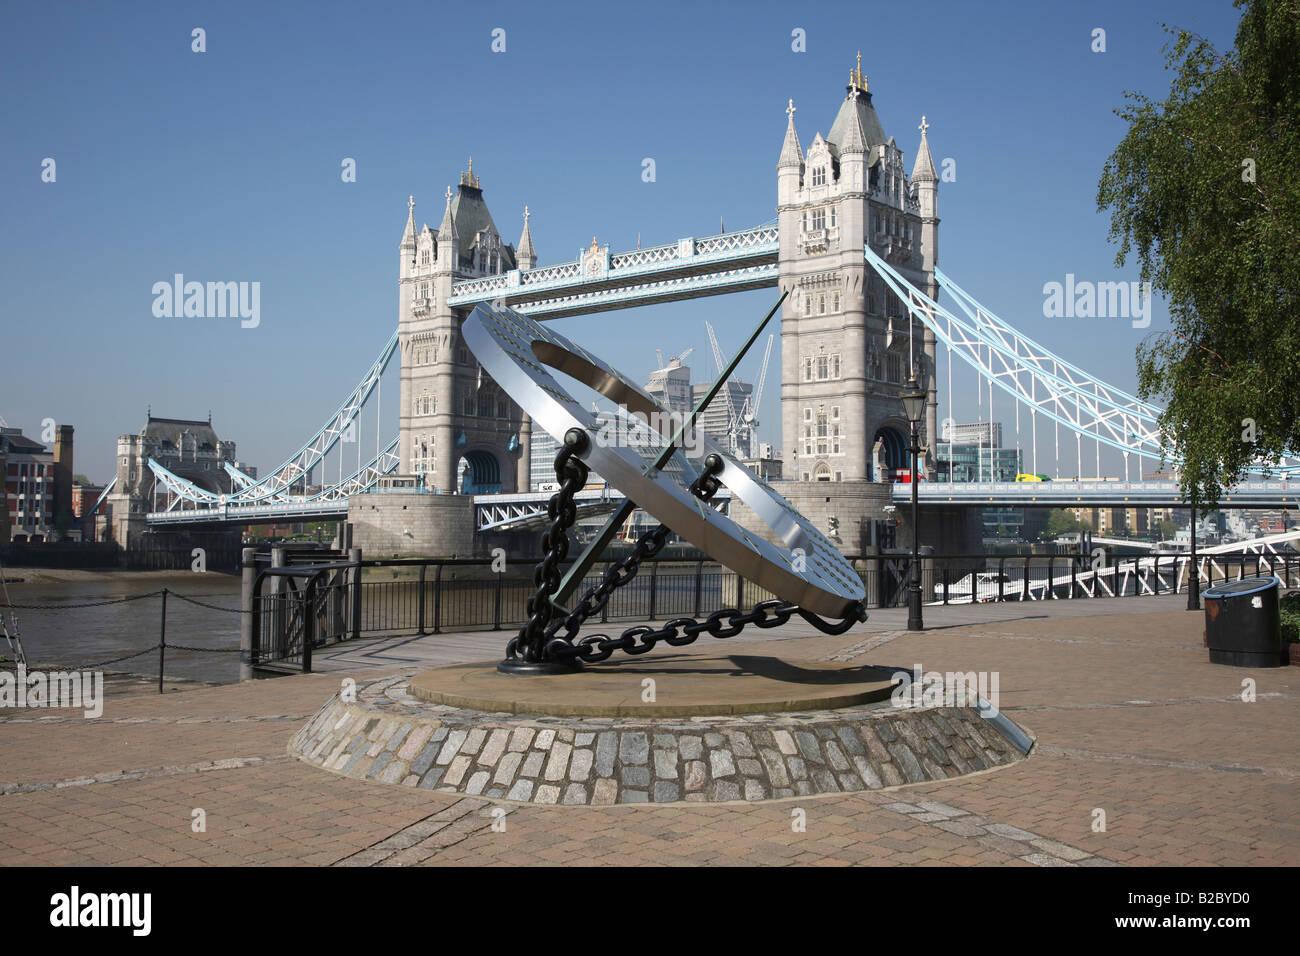 Pho London Stock Photos & Pho London Stock Images - Alamy